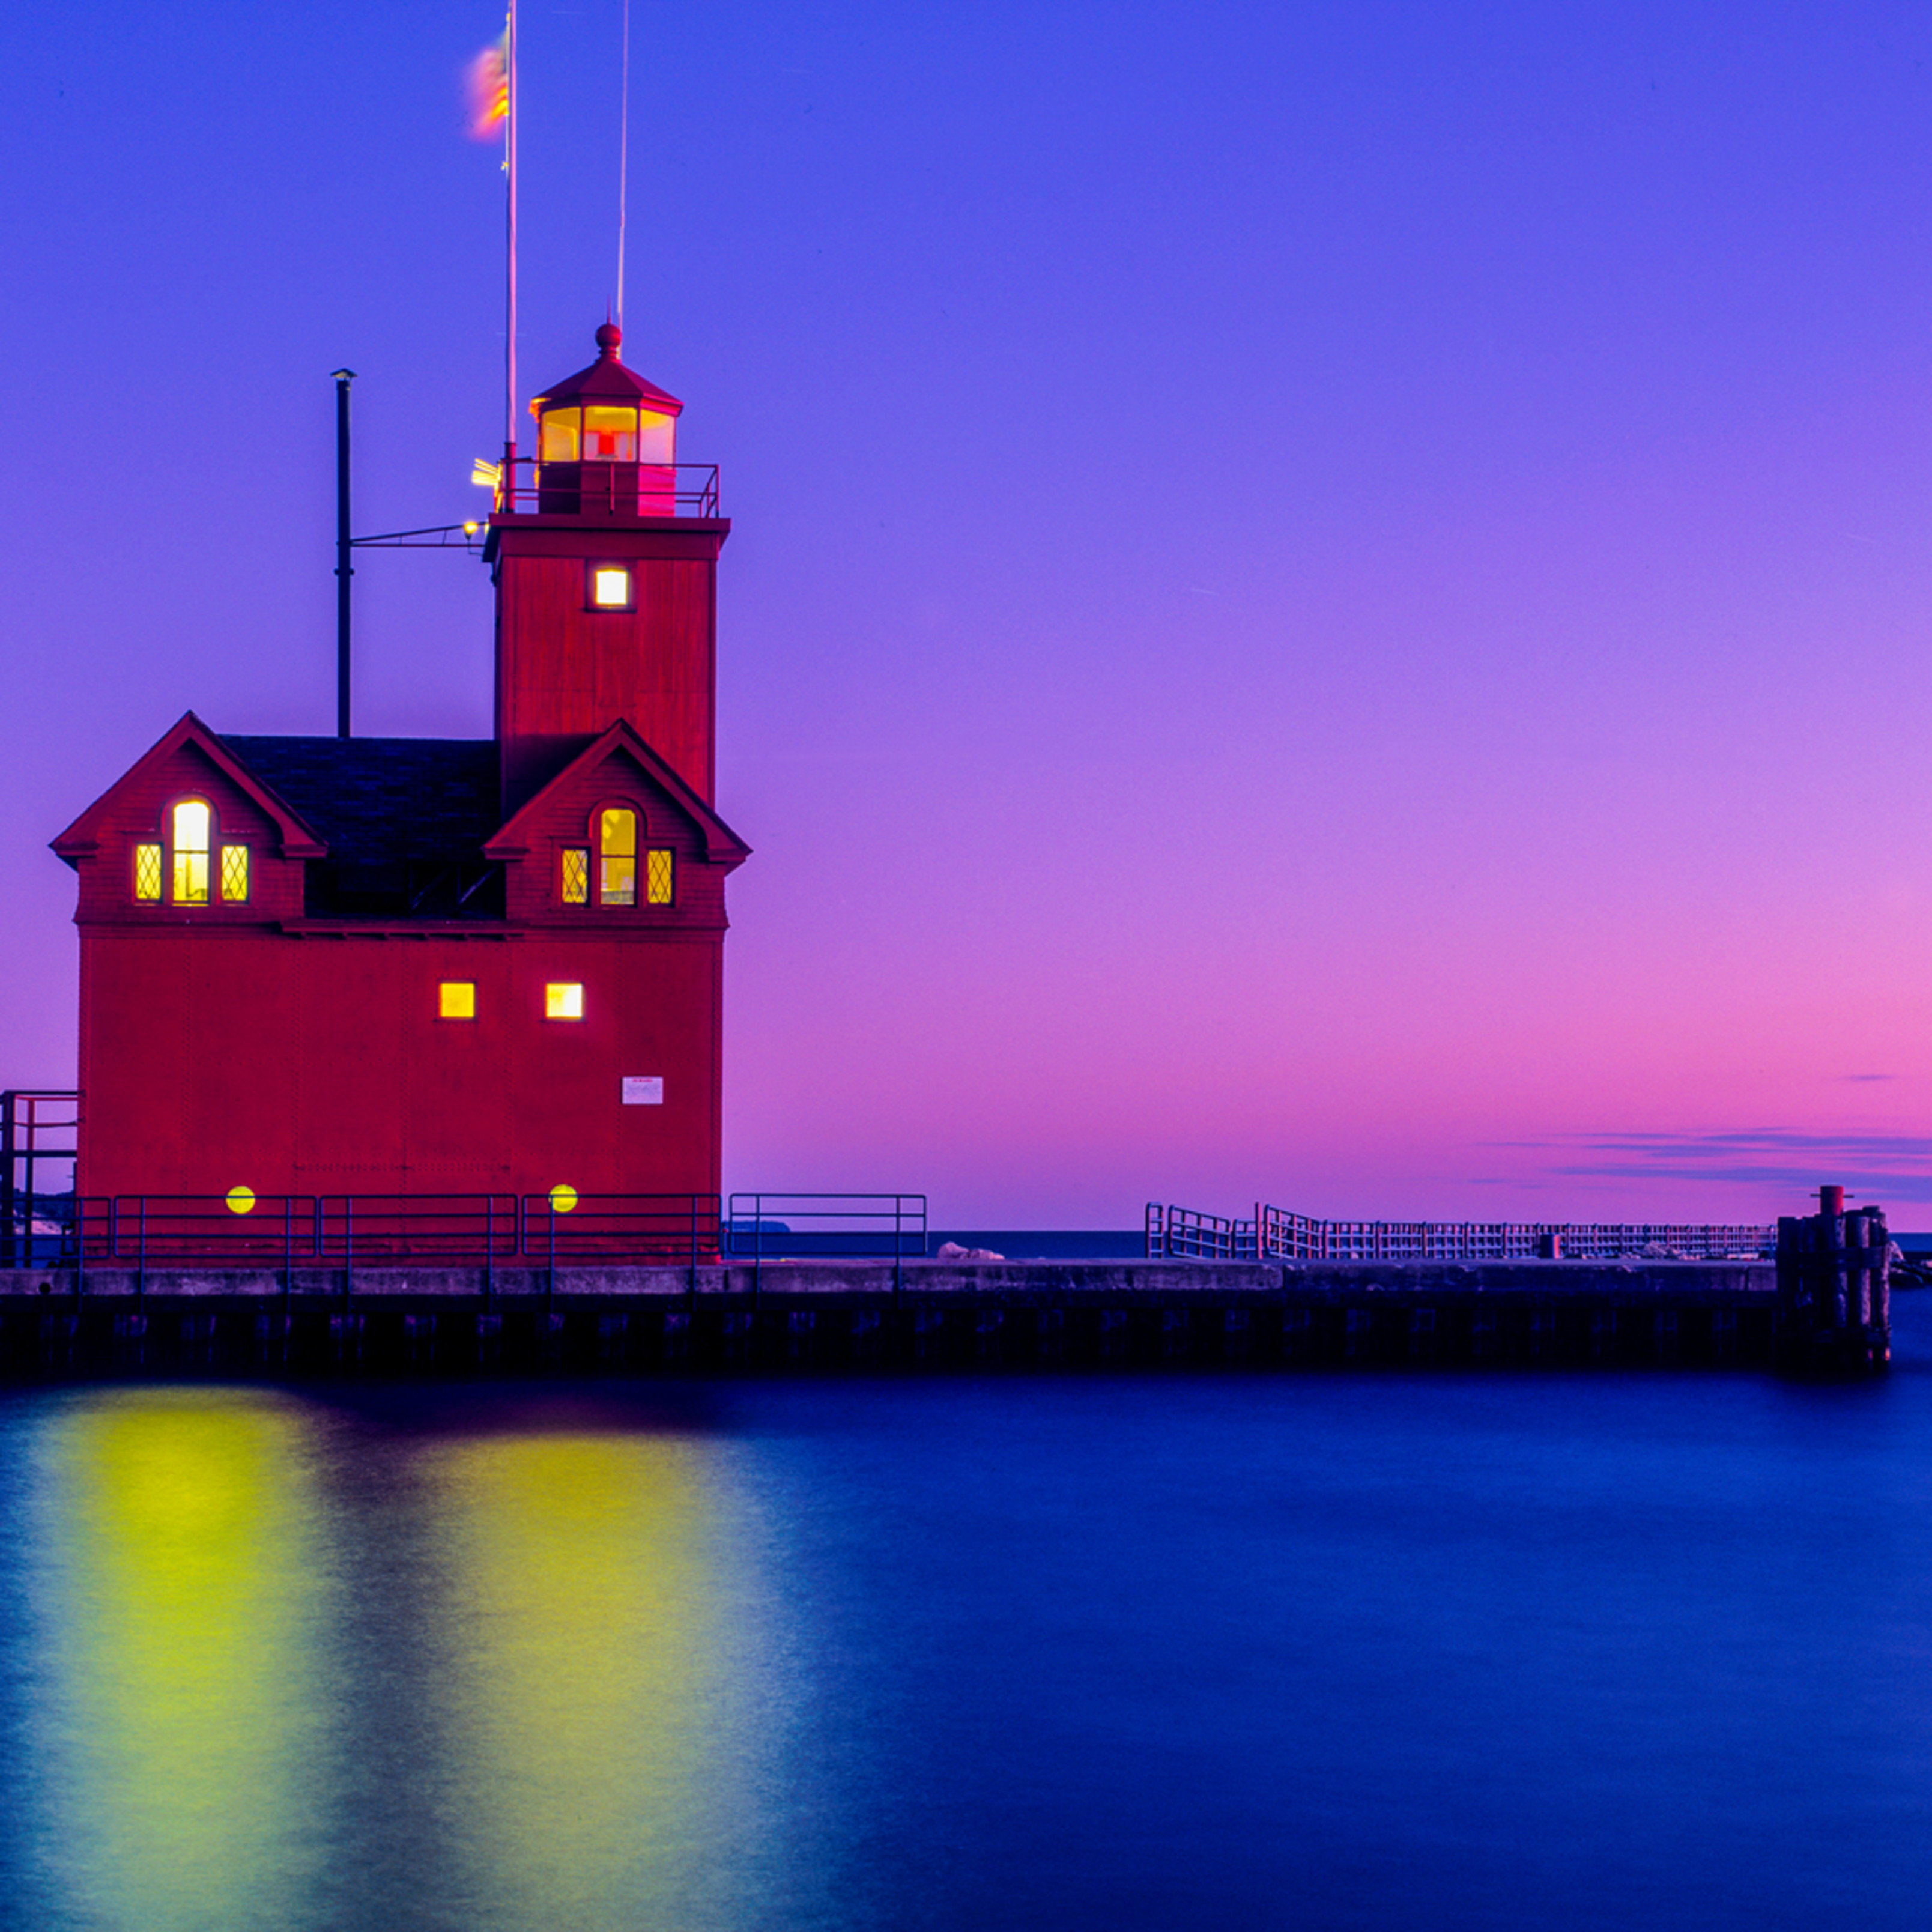 Big red light house lake mi. holland mi d45nsf